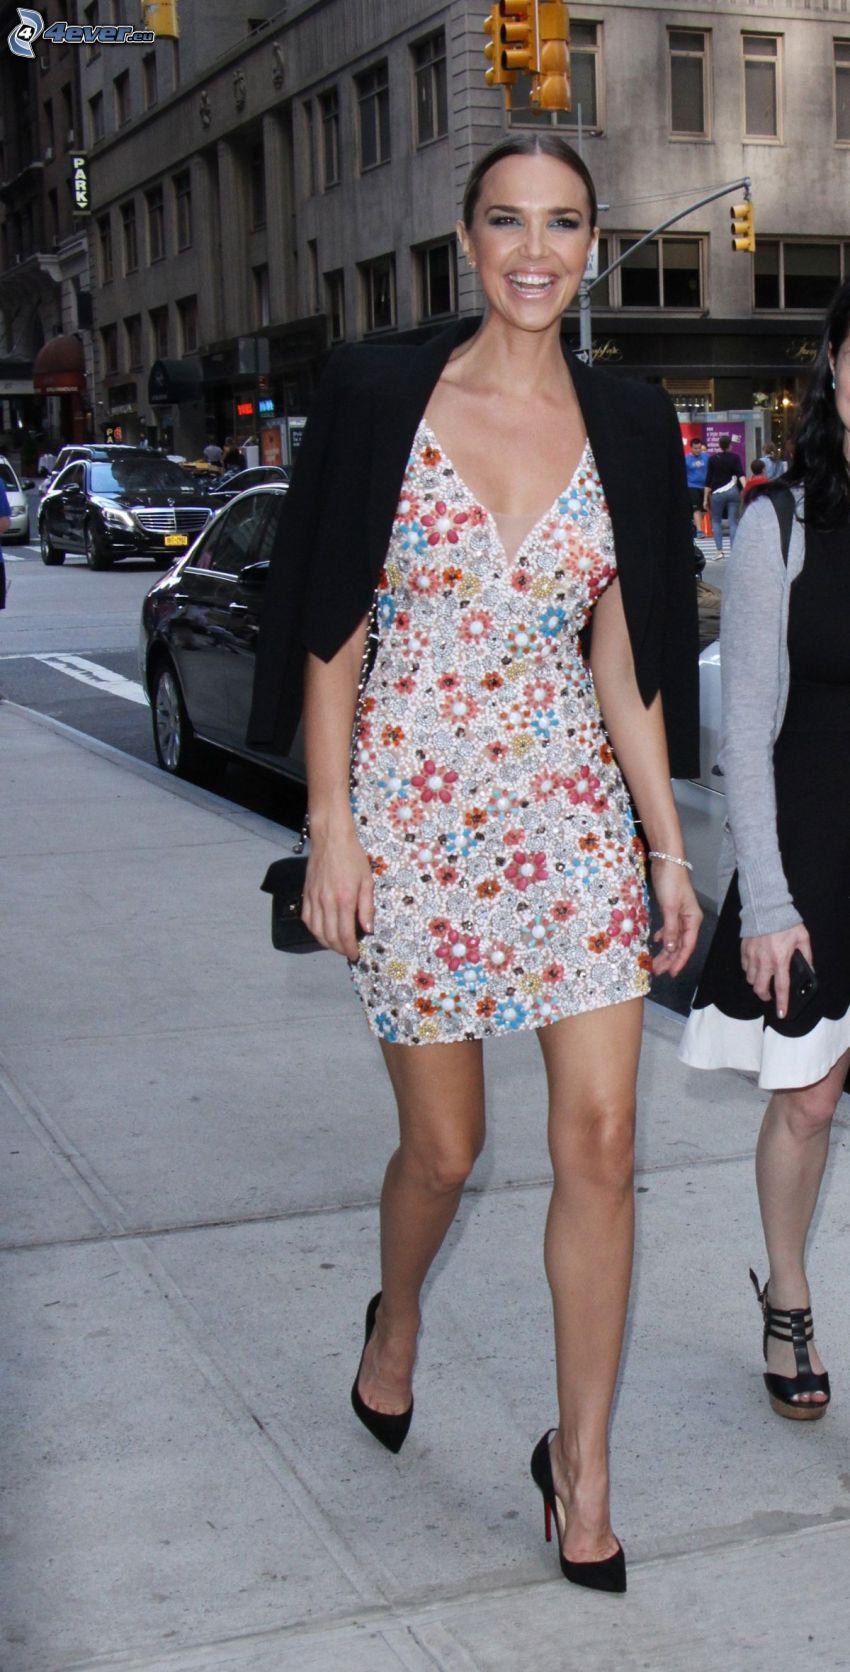 Arielle Kebbel, laughter, pumps, flowered dress, street